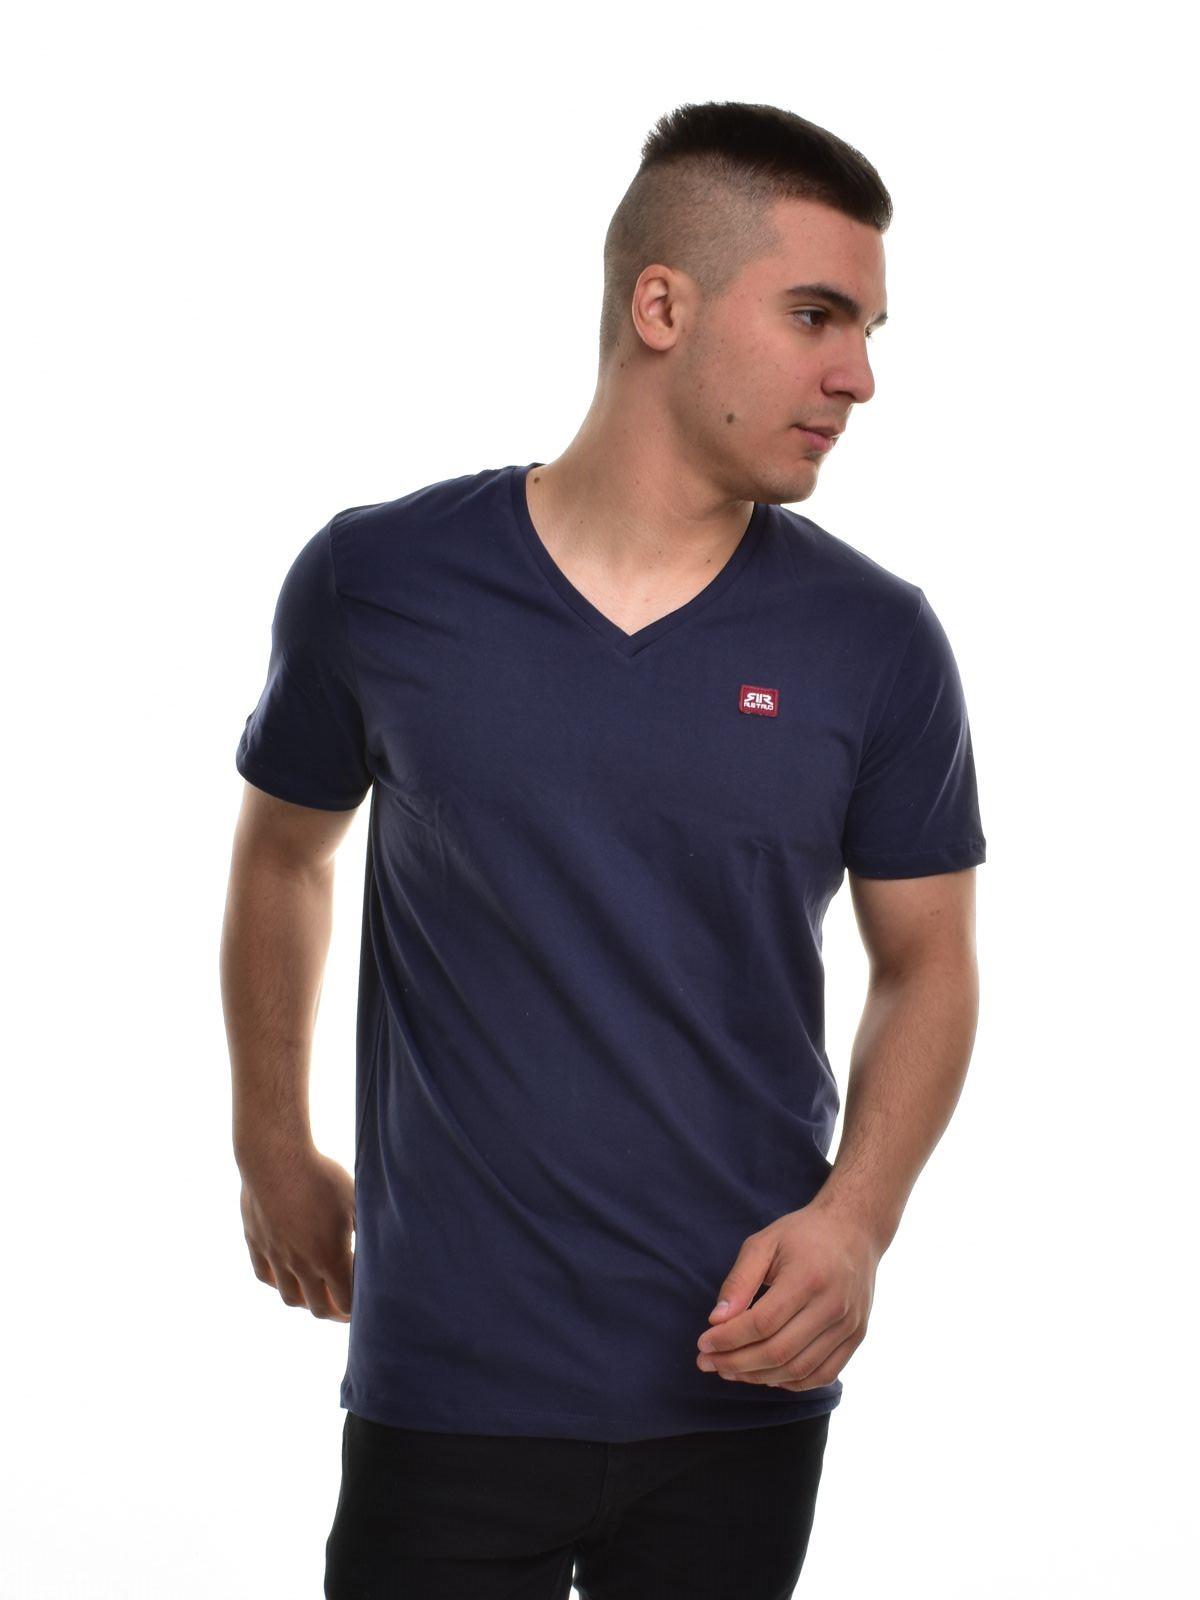 c109df4f92 Retro Jeans férfi póló ZENIT T-SHIRT   Markasbolt.hu Hivatalos RETRO ...